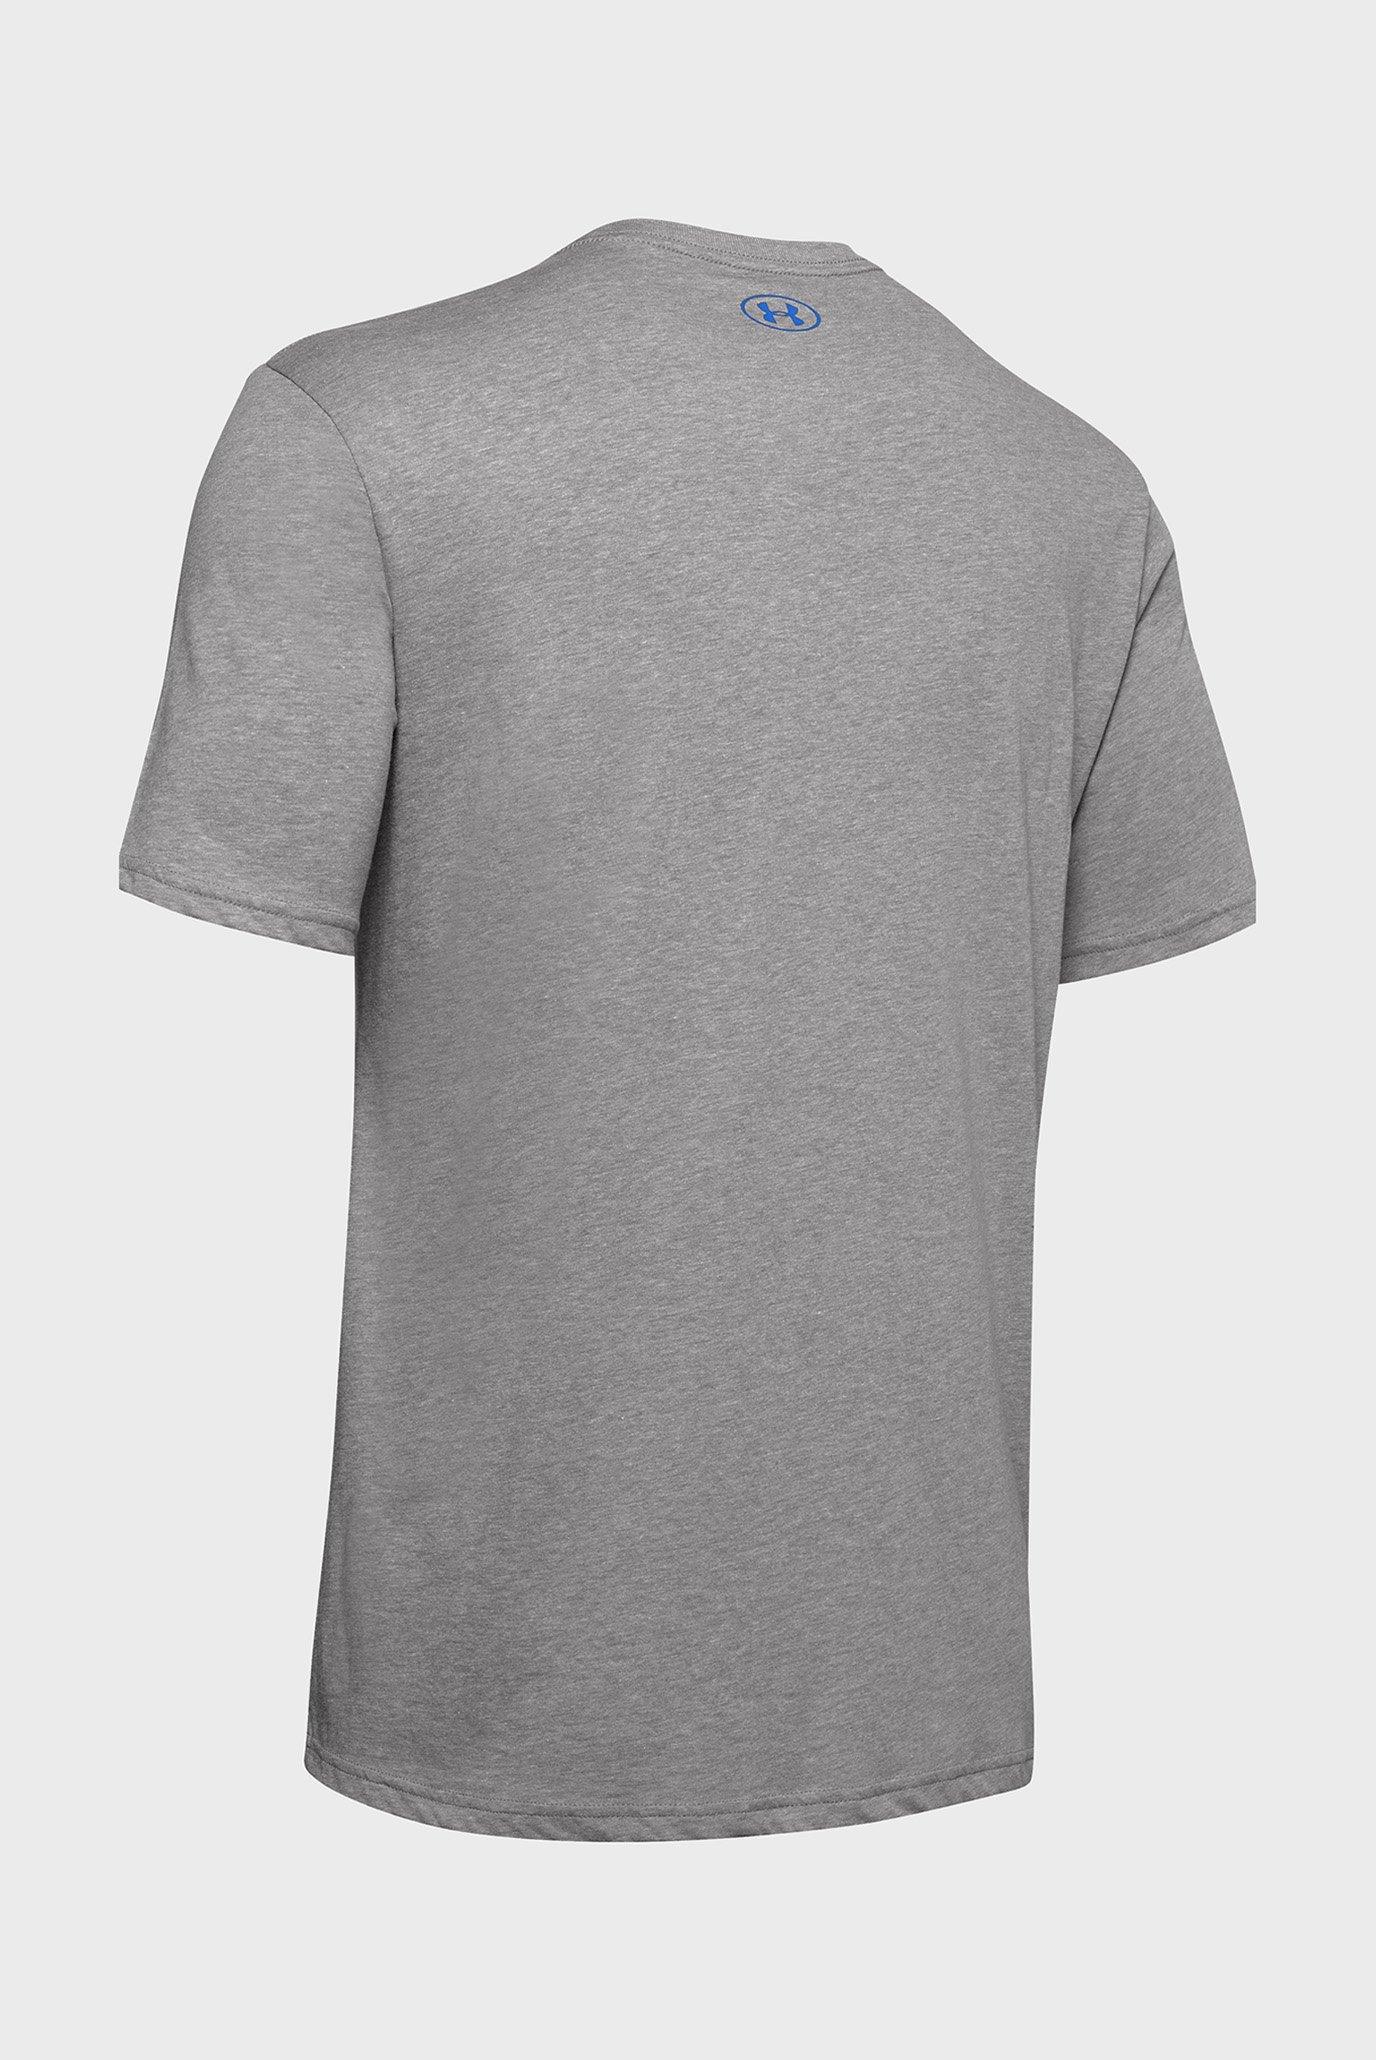 Мужская серая футболка UA GL Foundation SS T Under Armour